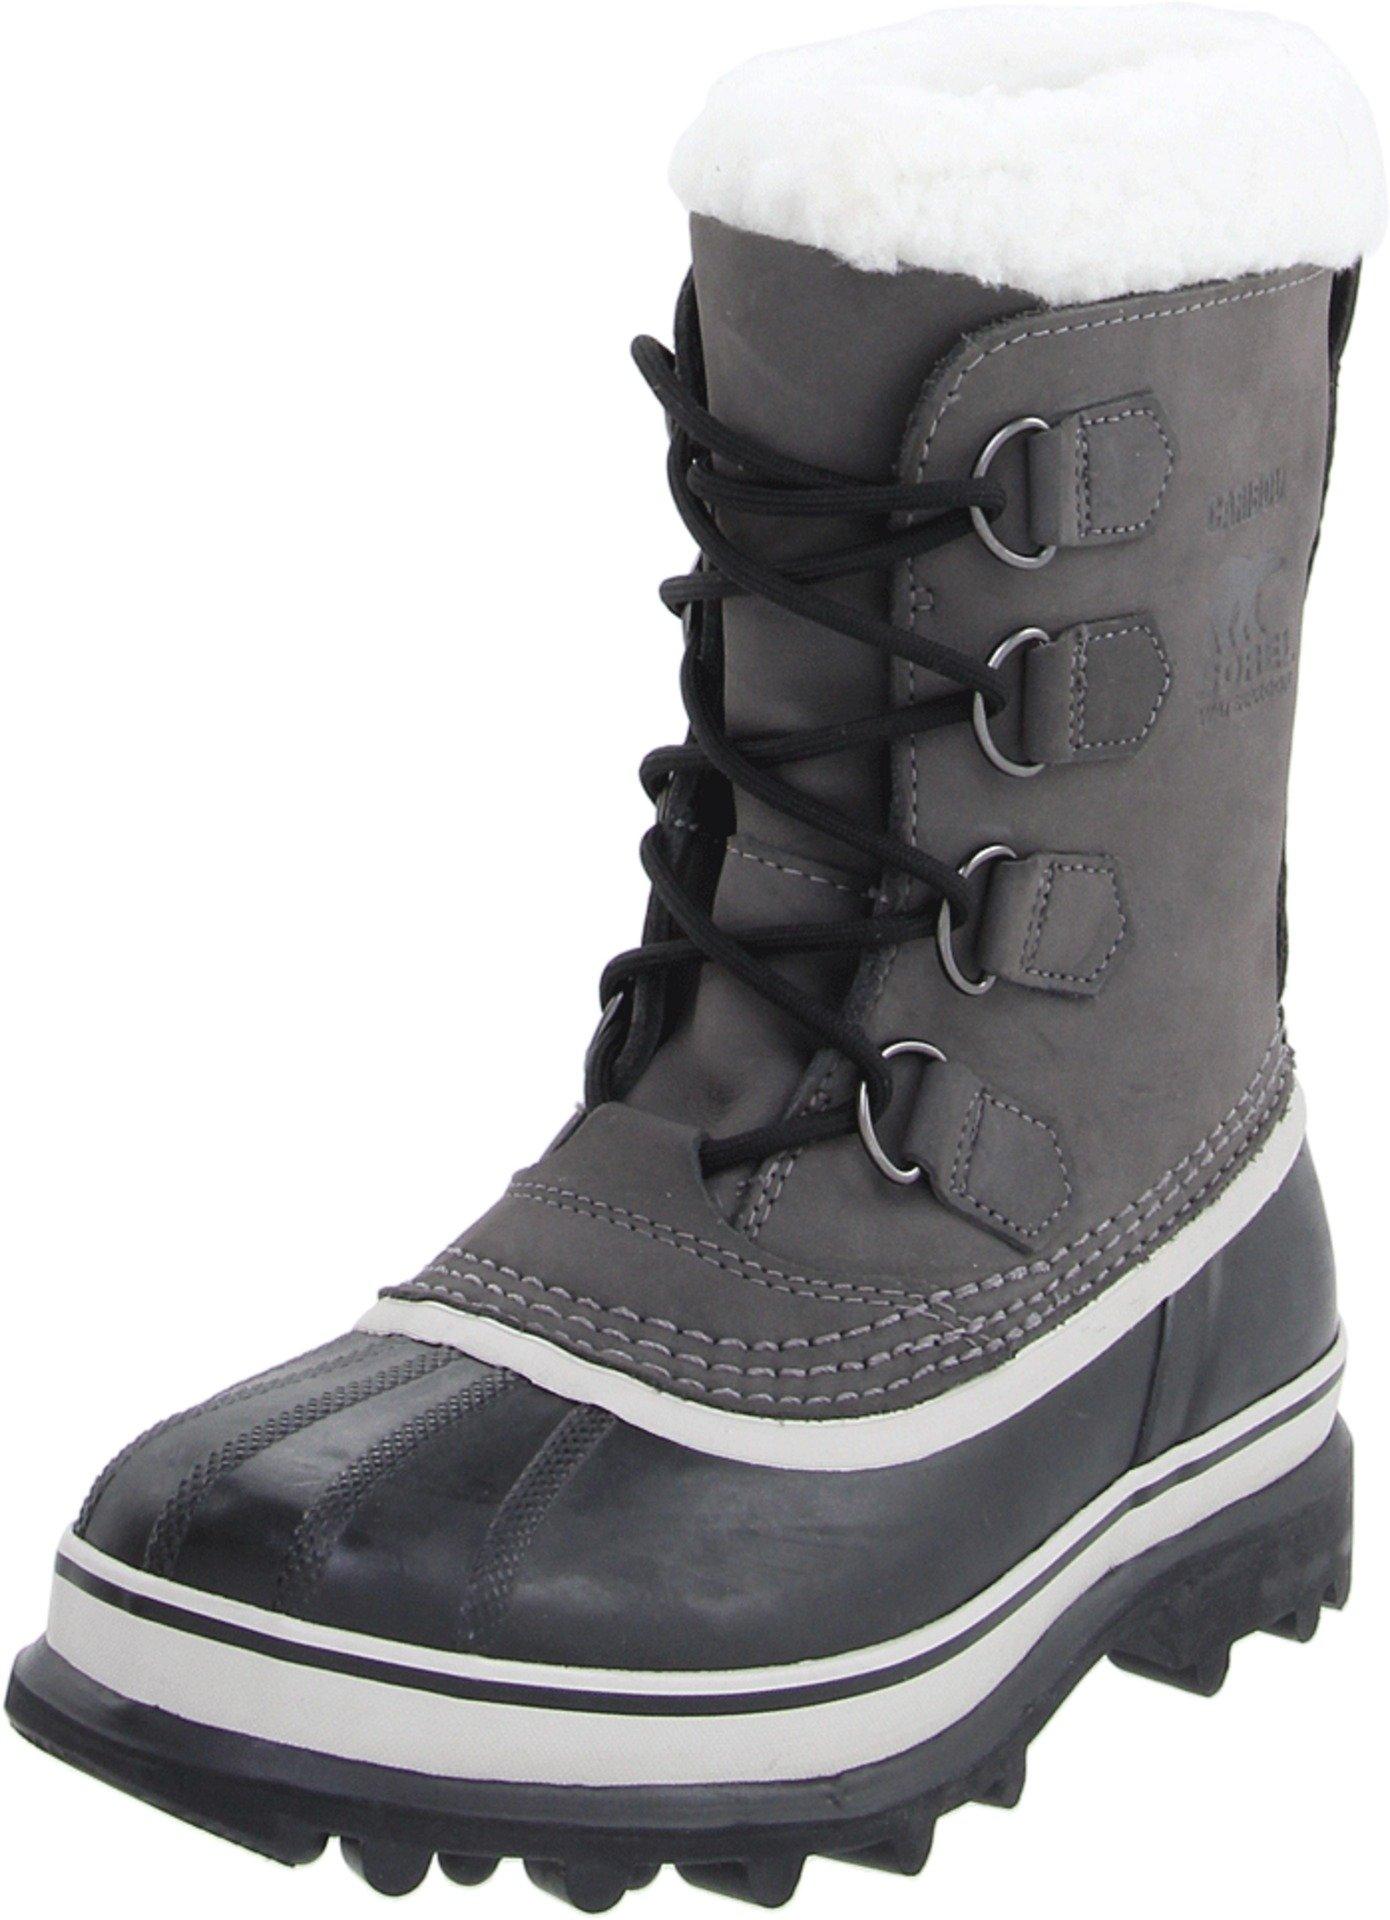 Sorel Women's Caribou Boot (8.5 B(M) US, Shale/stone)